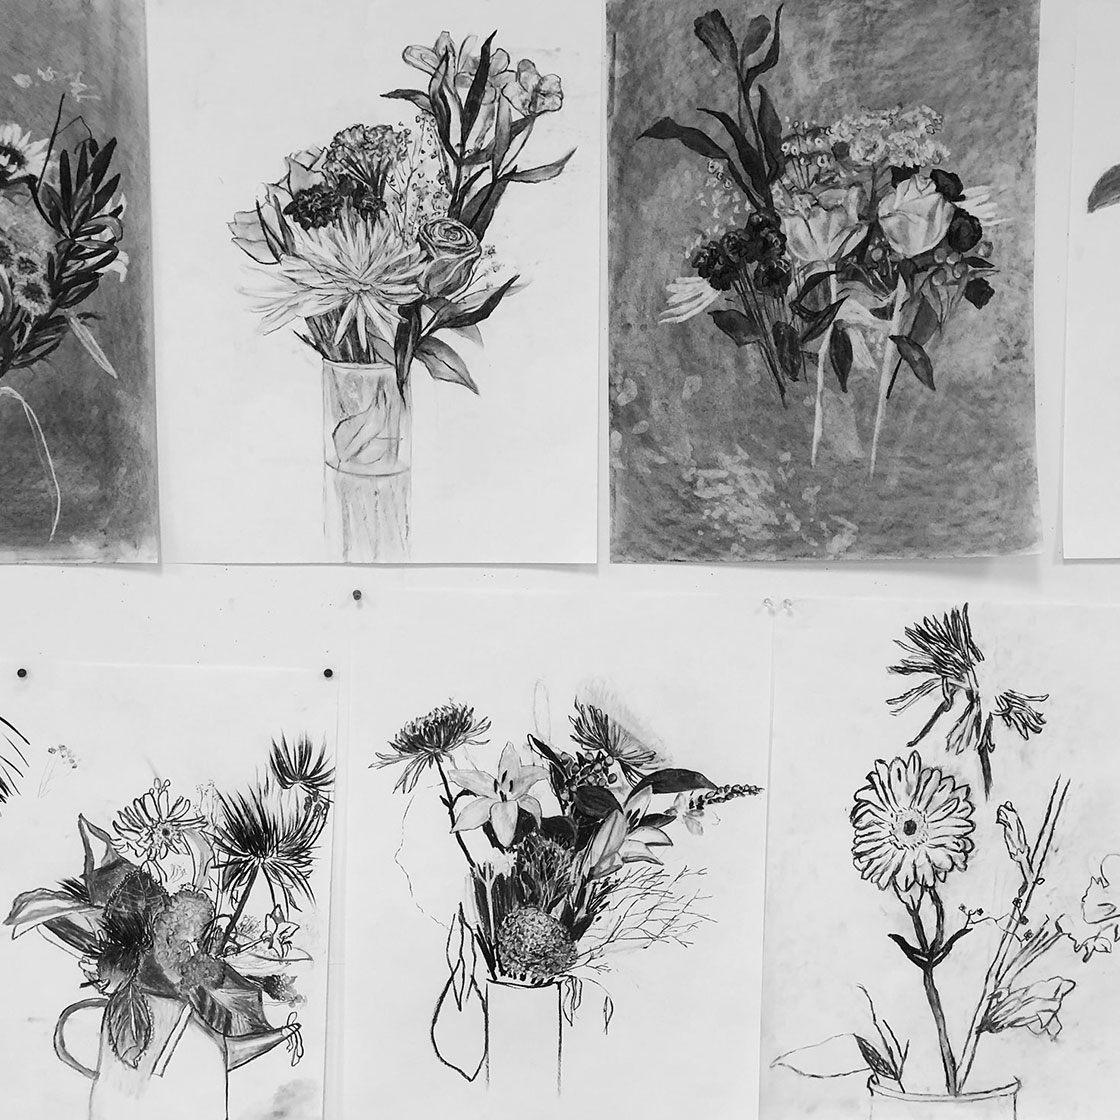 Sketches of floral arrangements